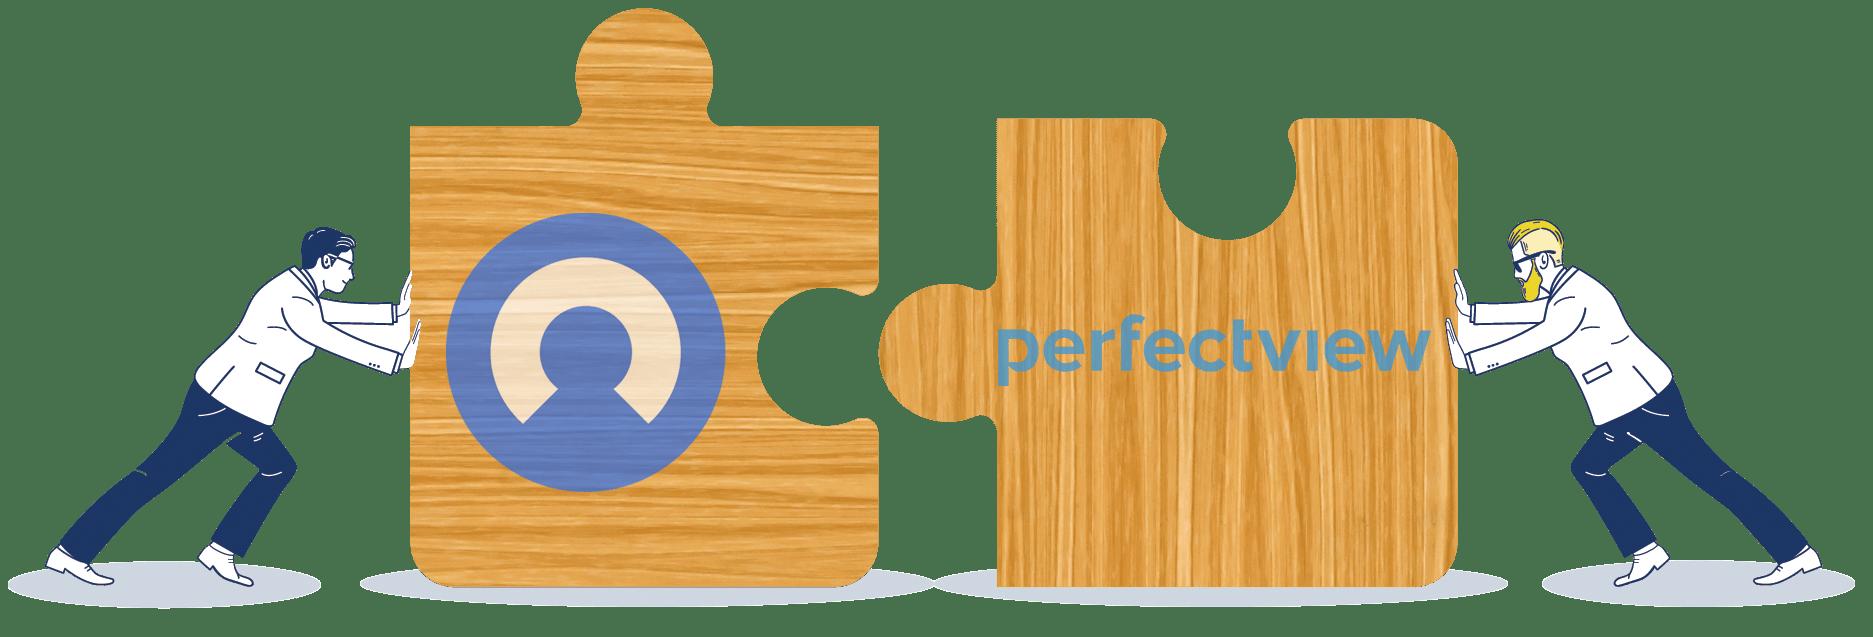 PerfectView CRM + slimme telefonie